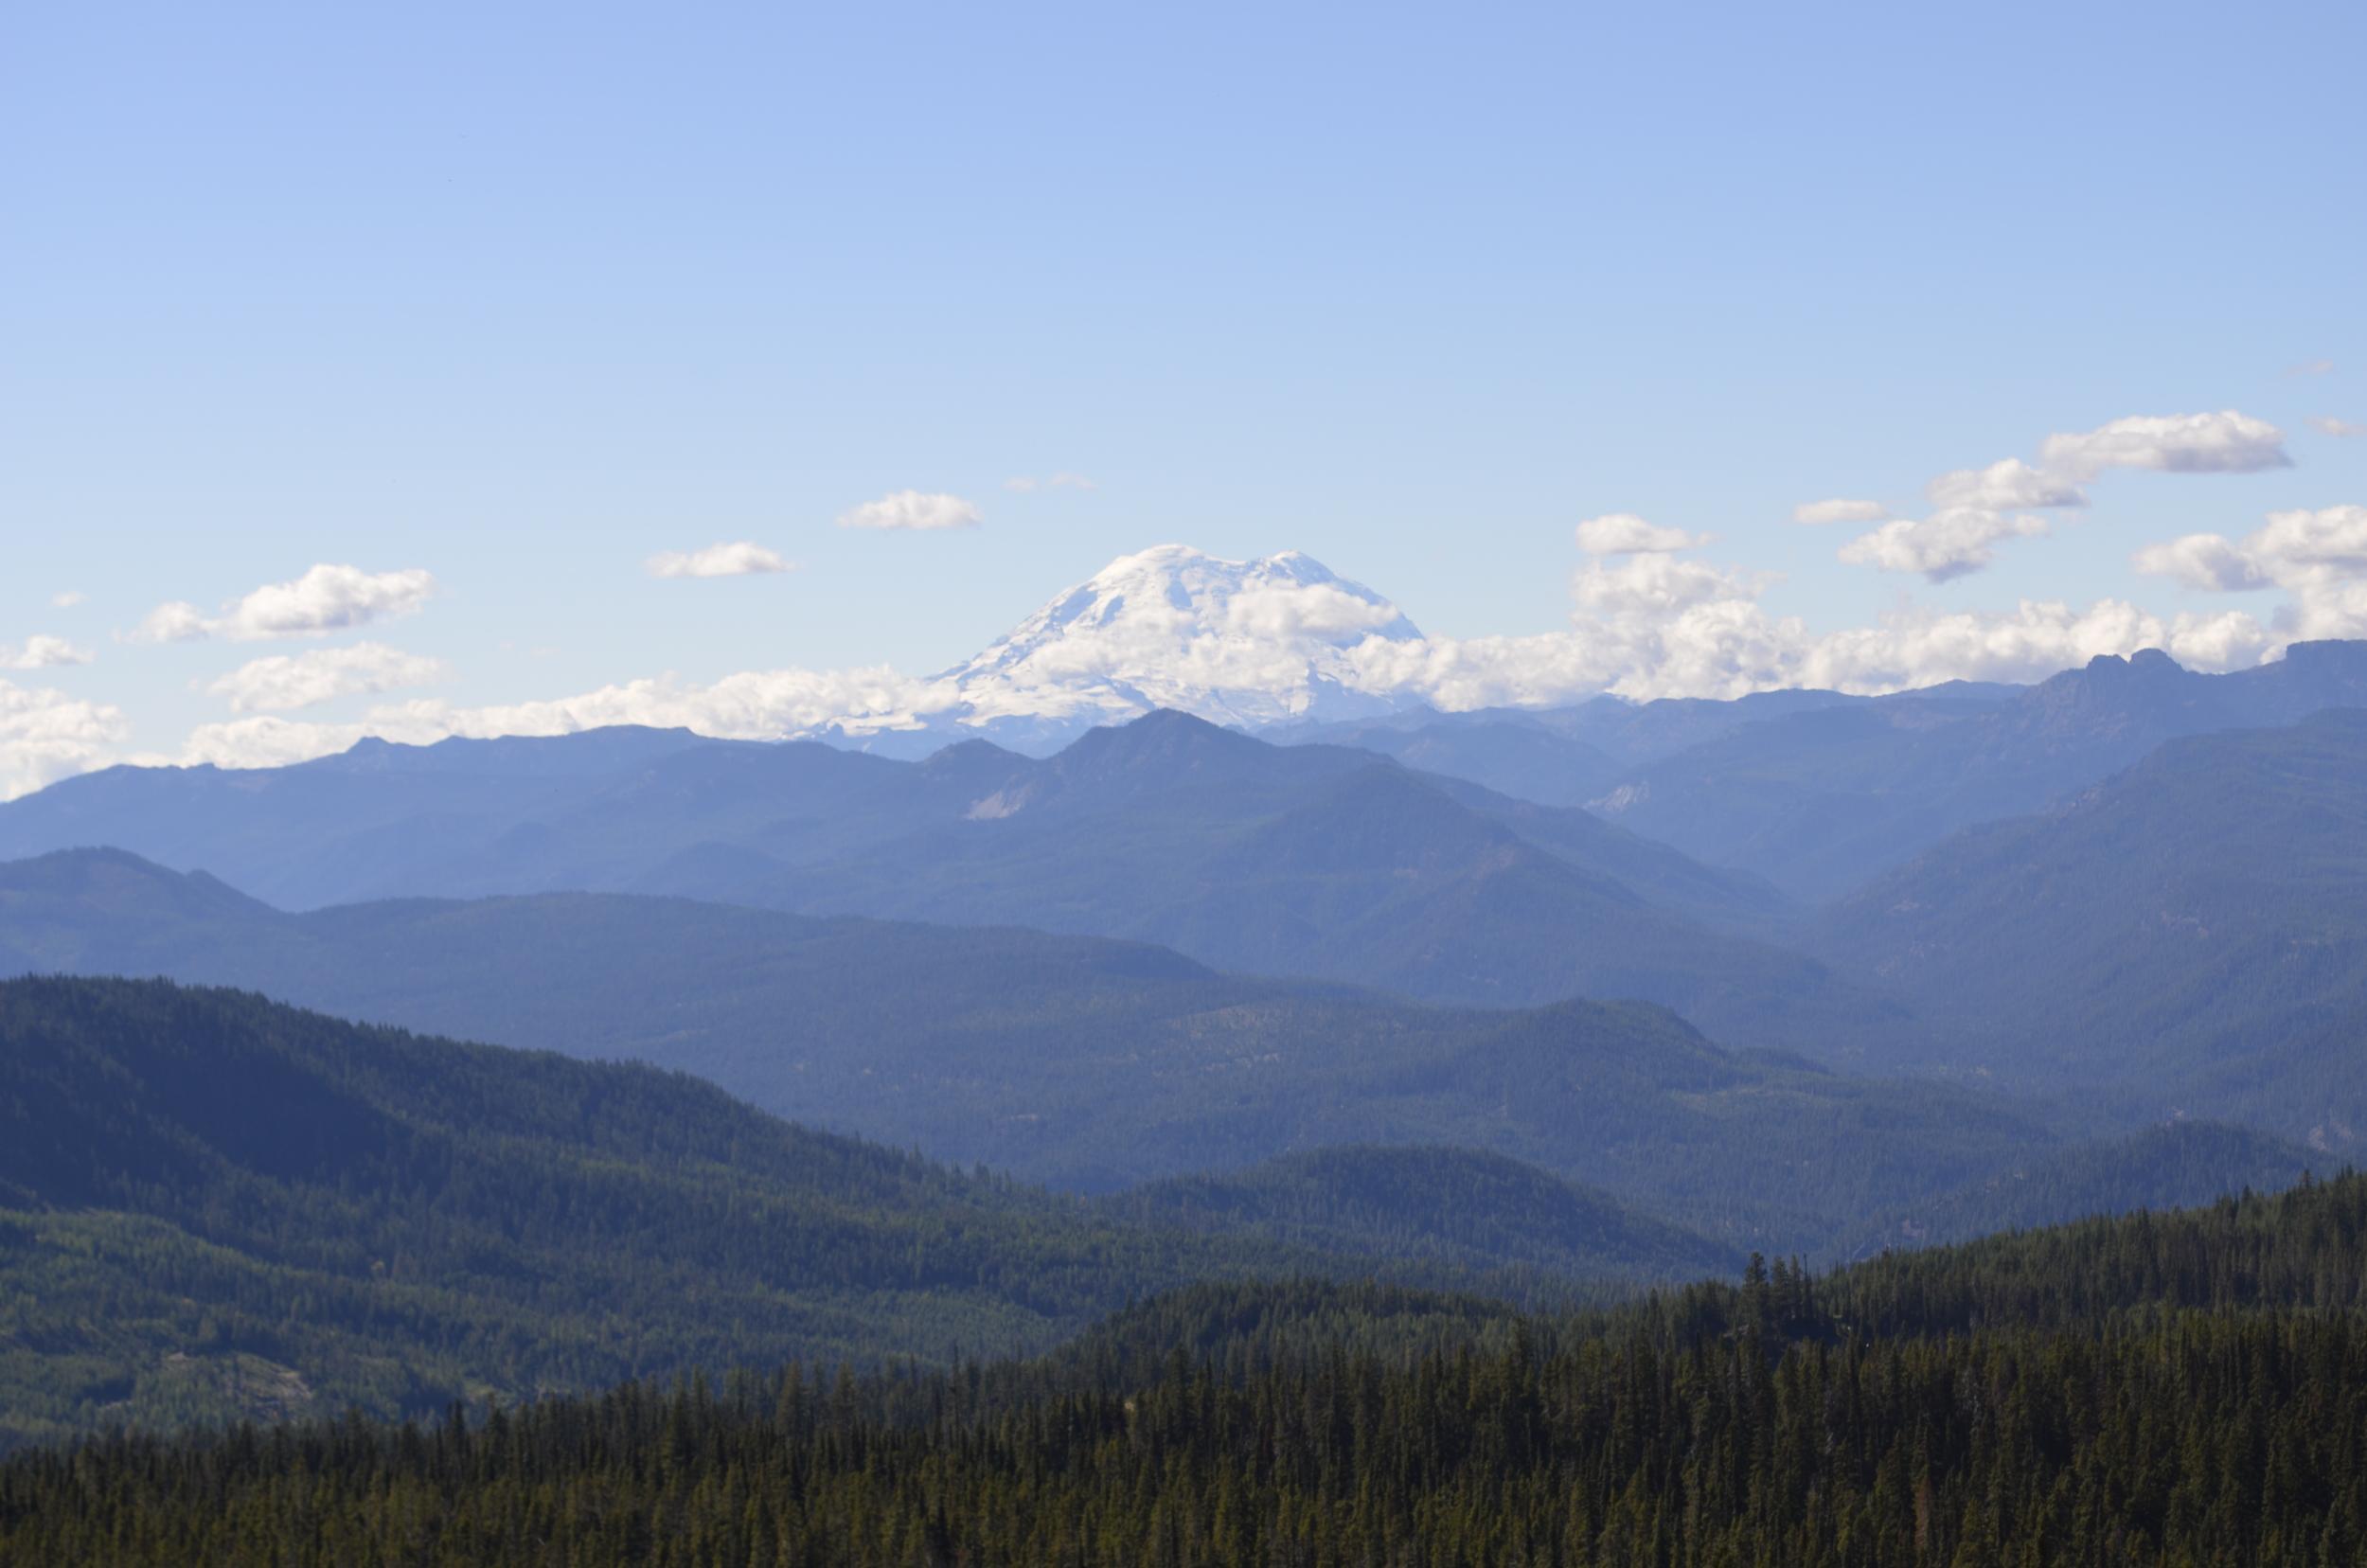 Mount Rainier keeps an eye on proceedings